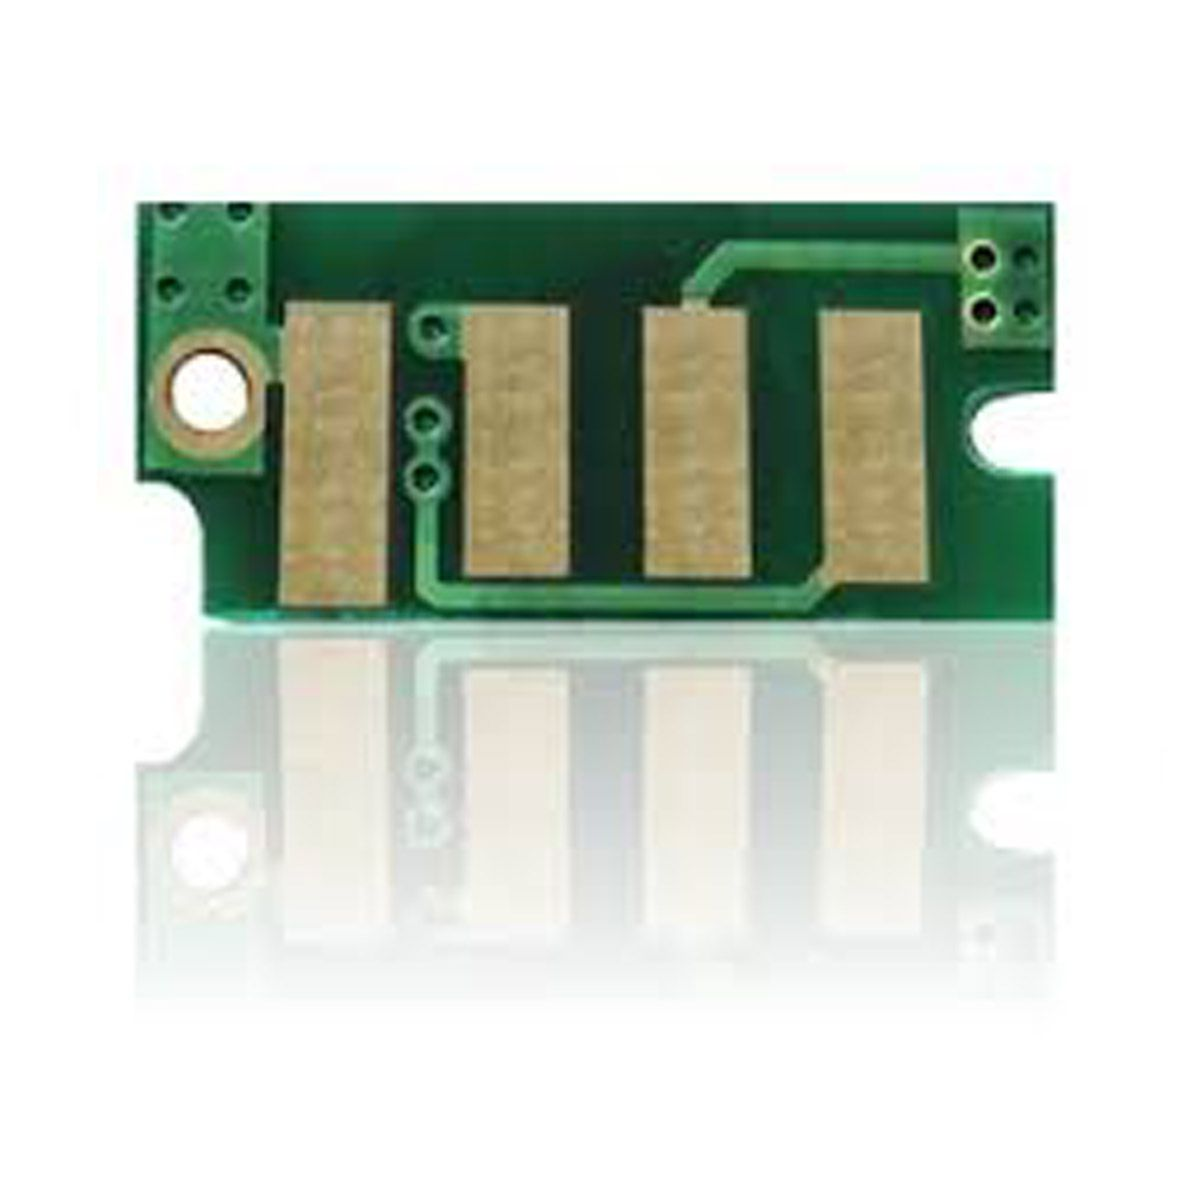 Chip Xerox Phaser 3045 3040 3010 - 106R02180 | 106R02182 - 2K